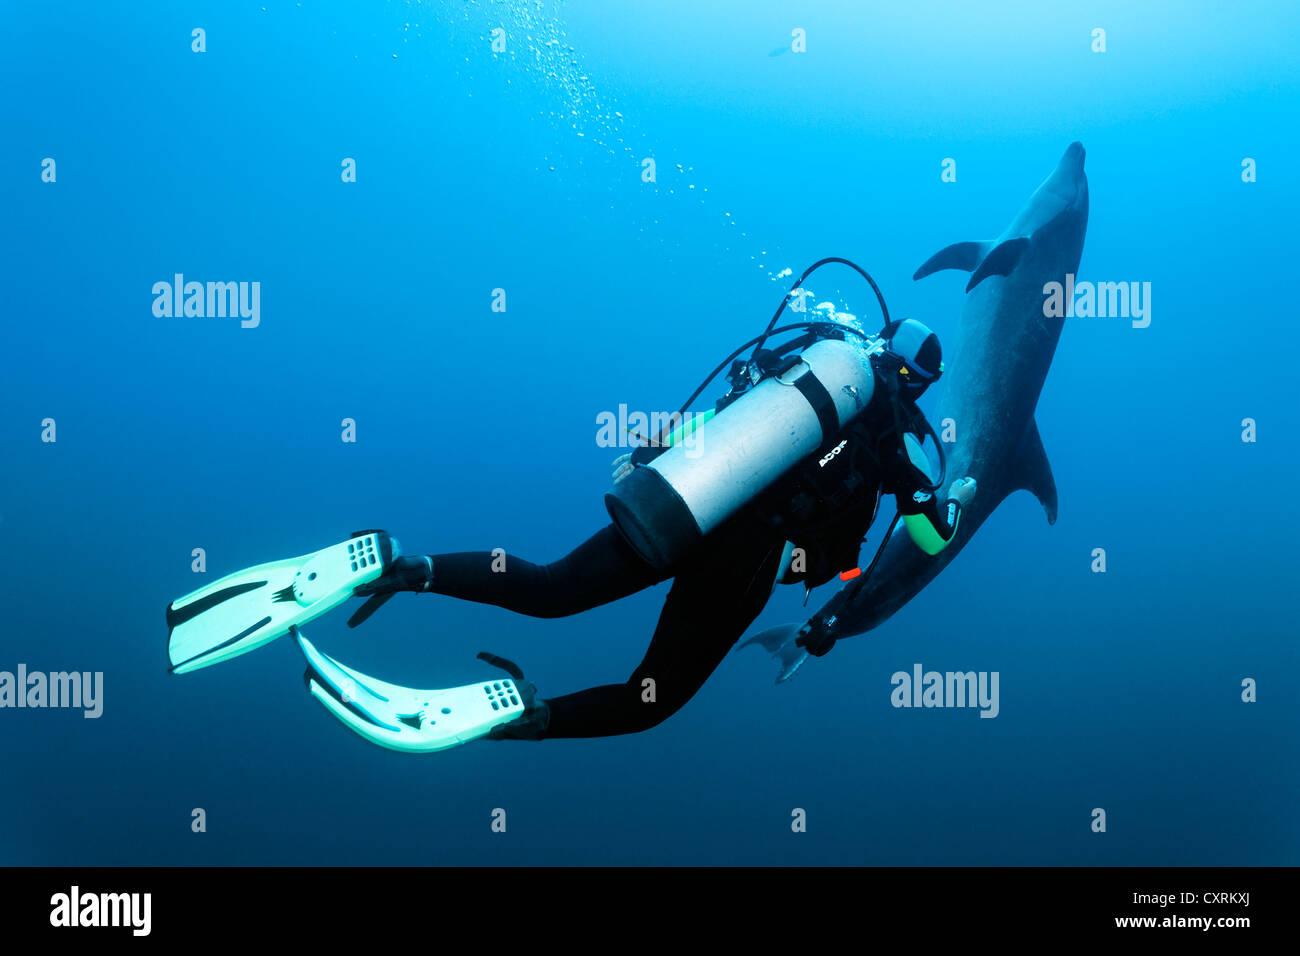 Suba diver watching a Bottlenose Dolphin (Tursiops truncatus), Roca Partida, Revillagigedo Islands, Mexico, America - Stock Image